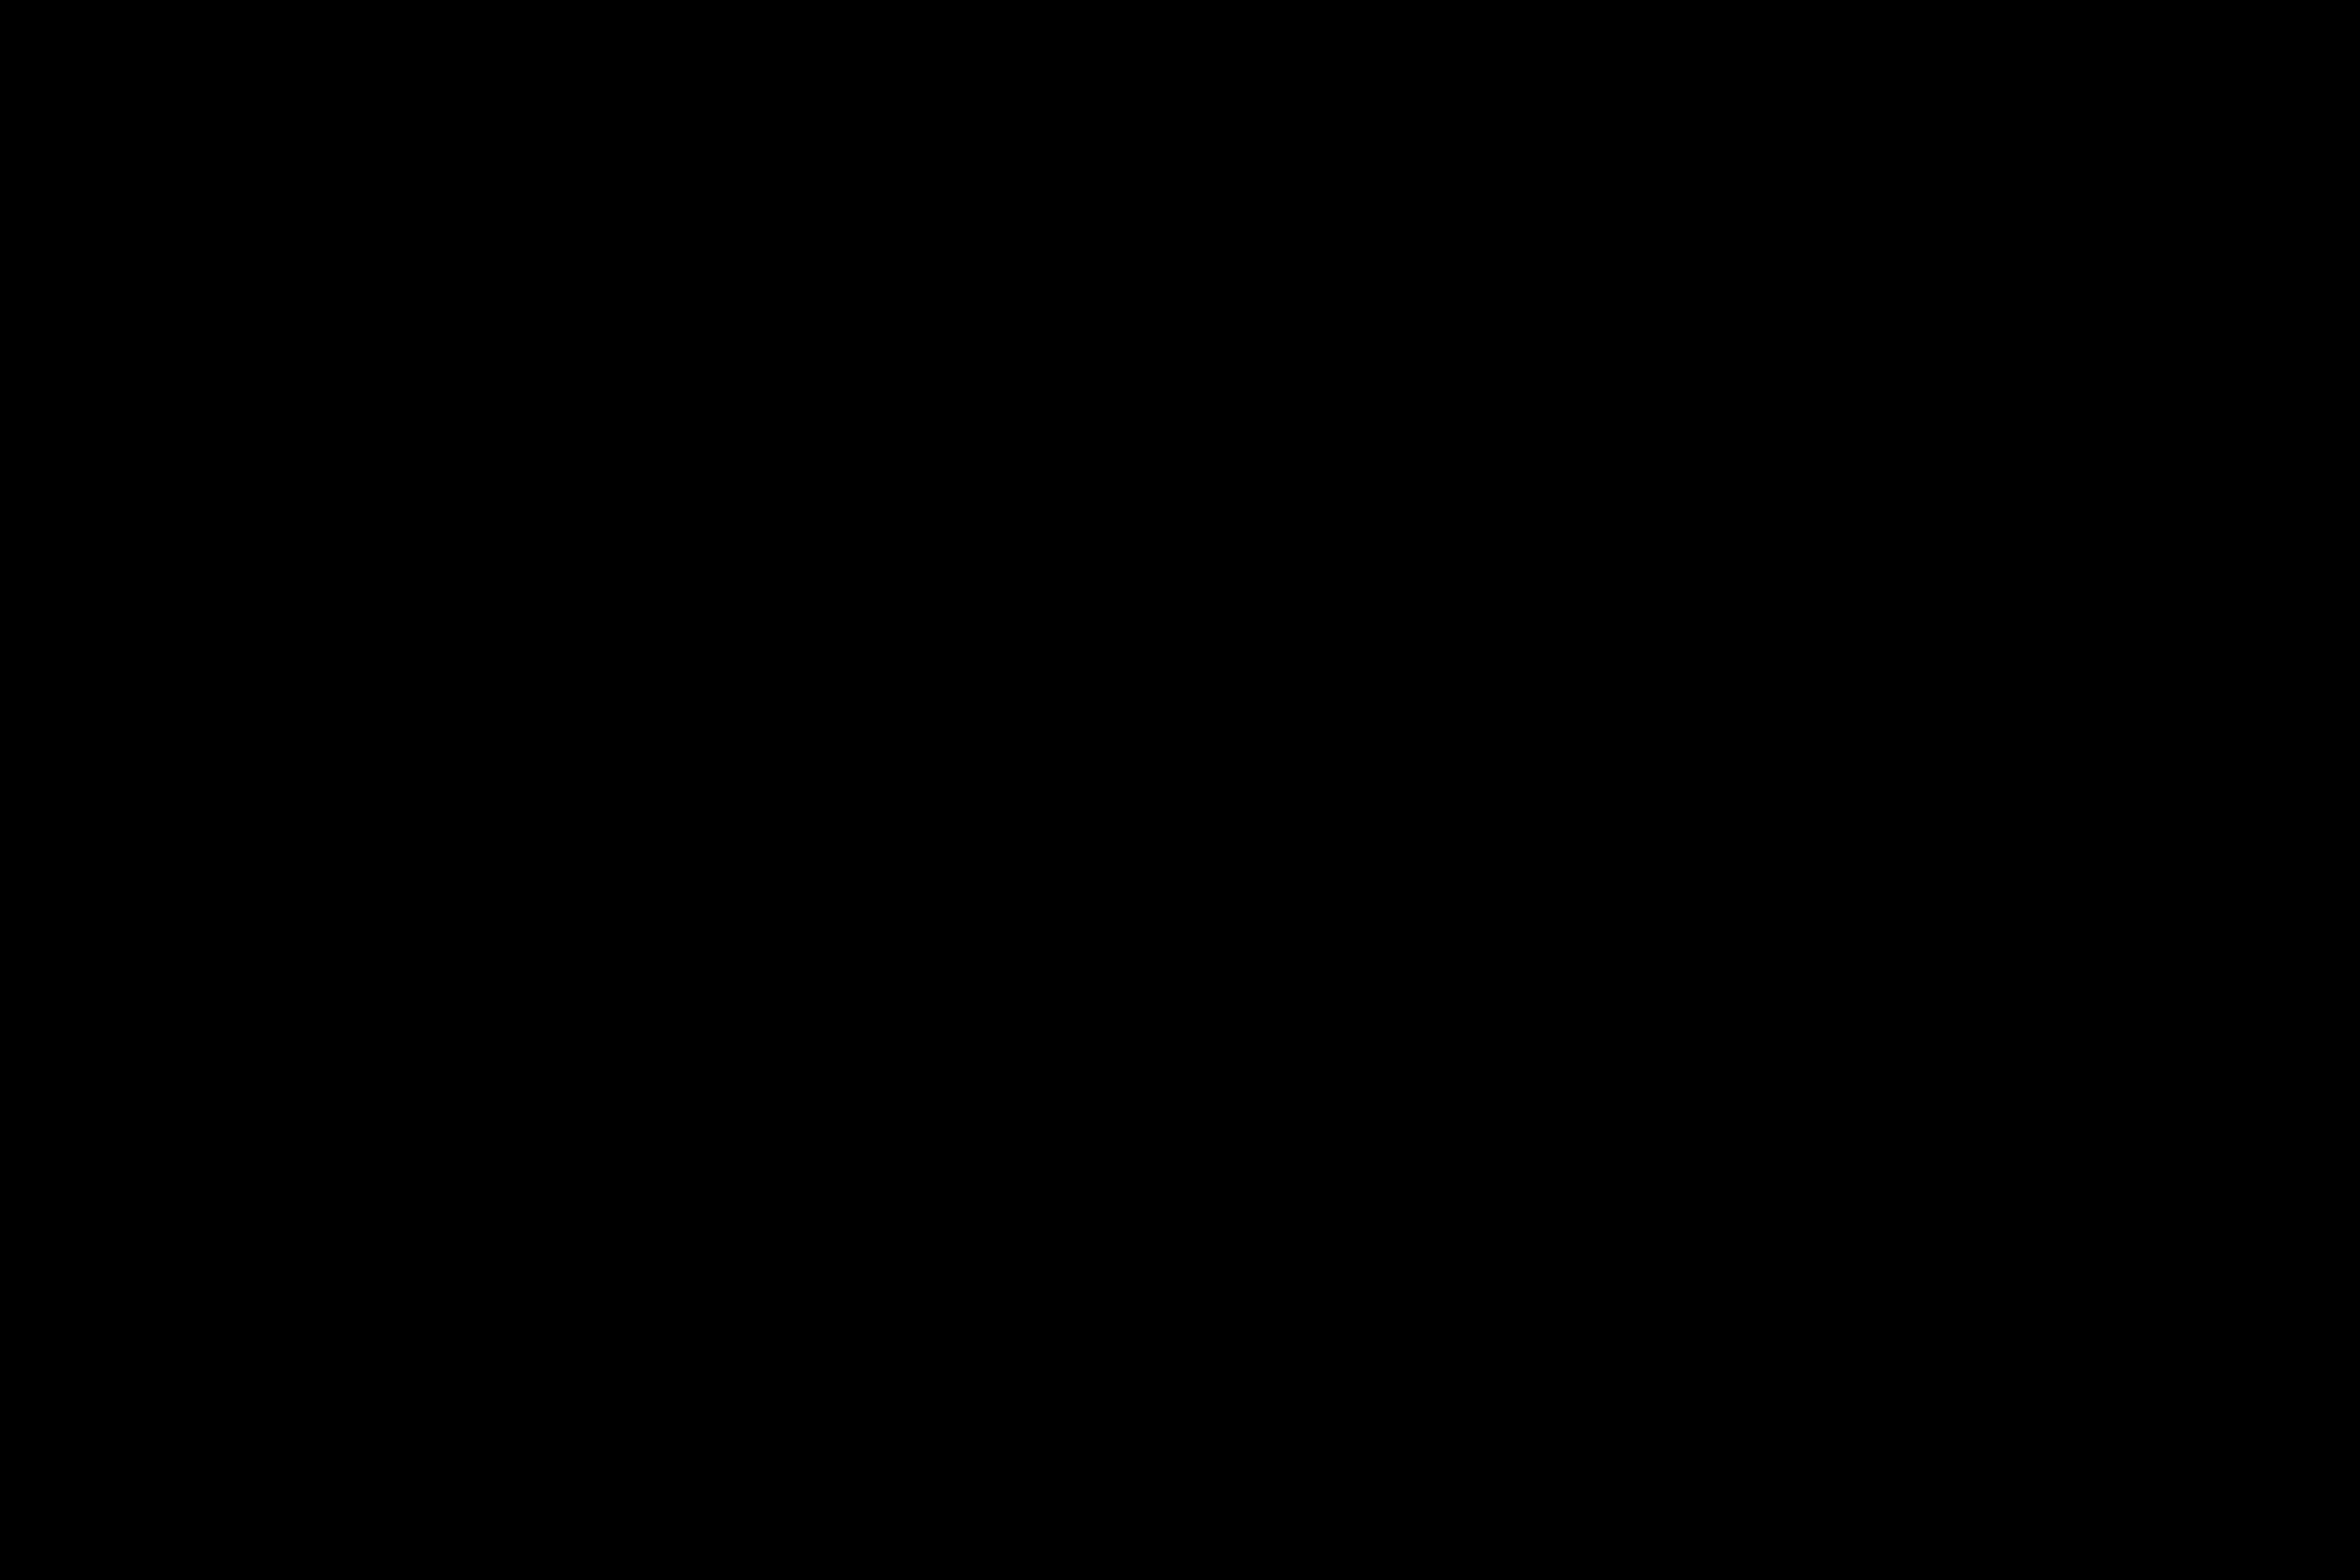 mg_2335